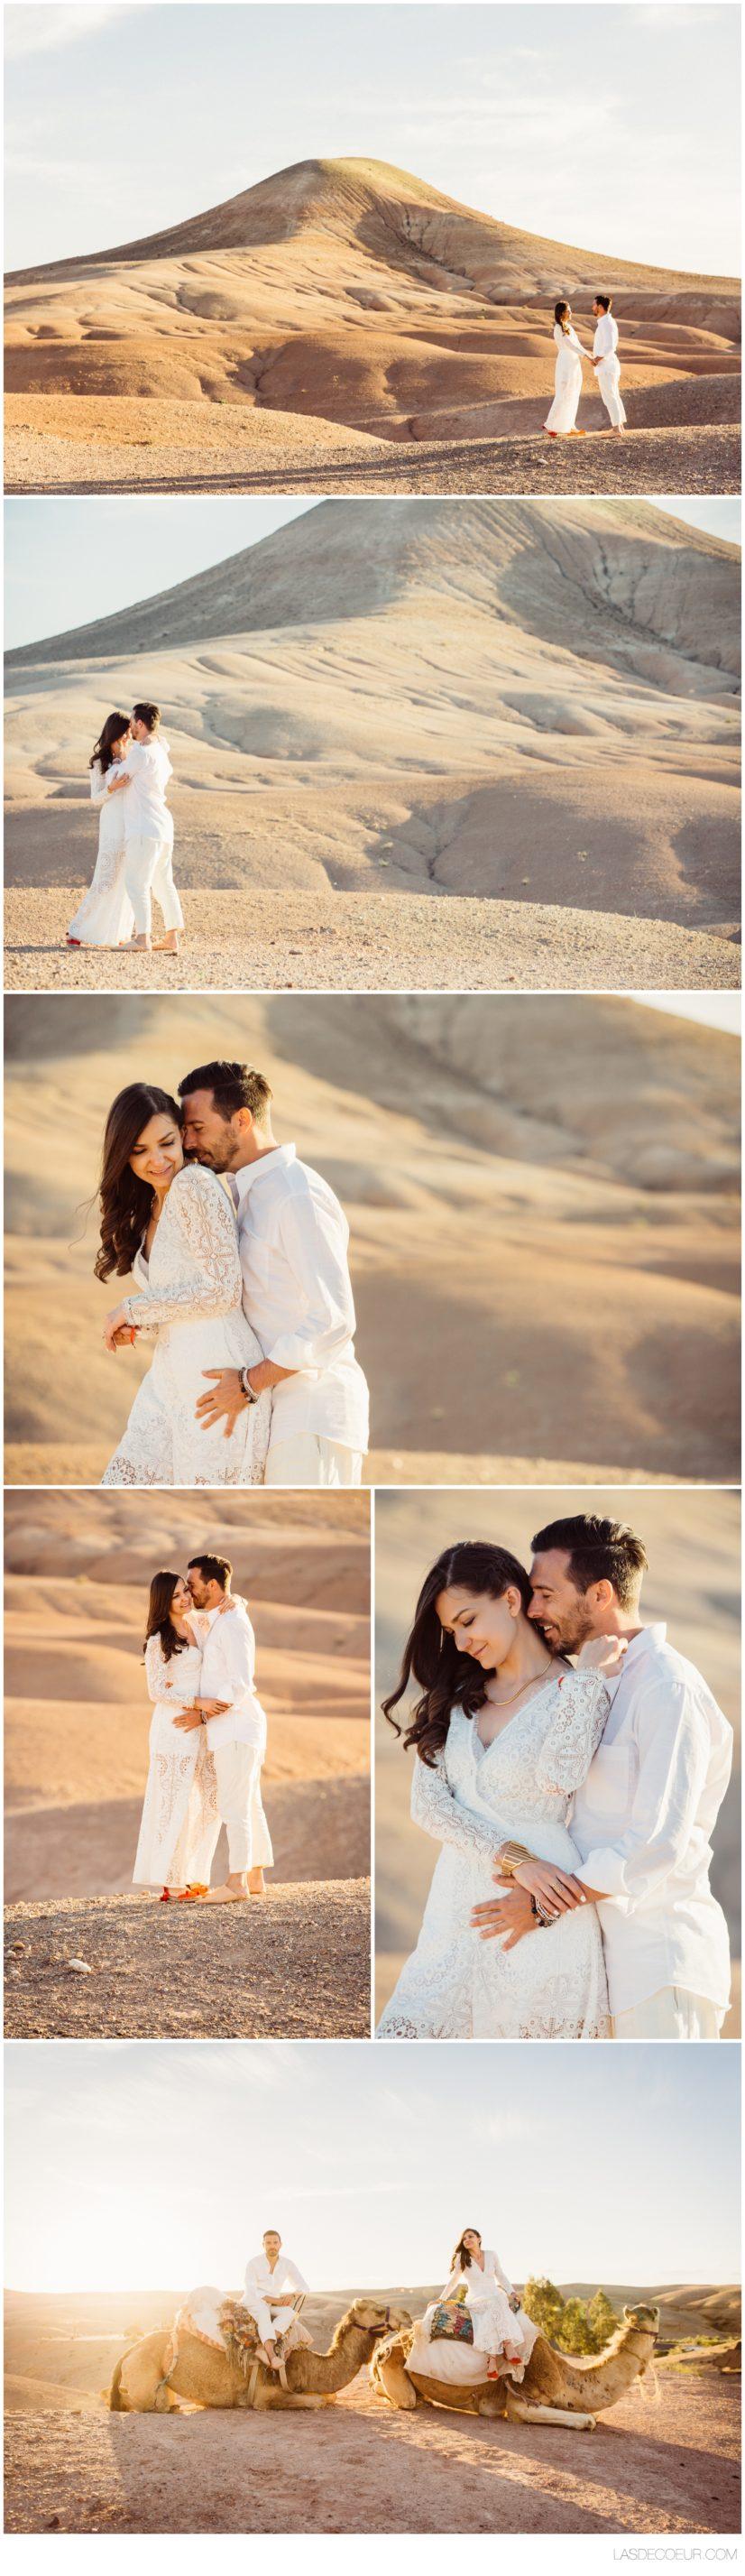 Photo de couple Mariage Marrakech désert d'Agafay